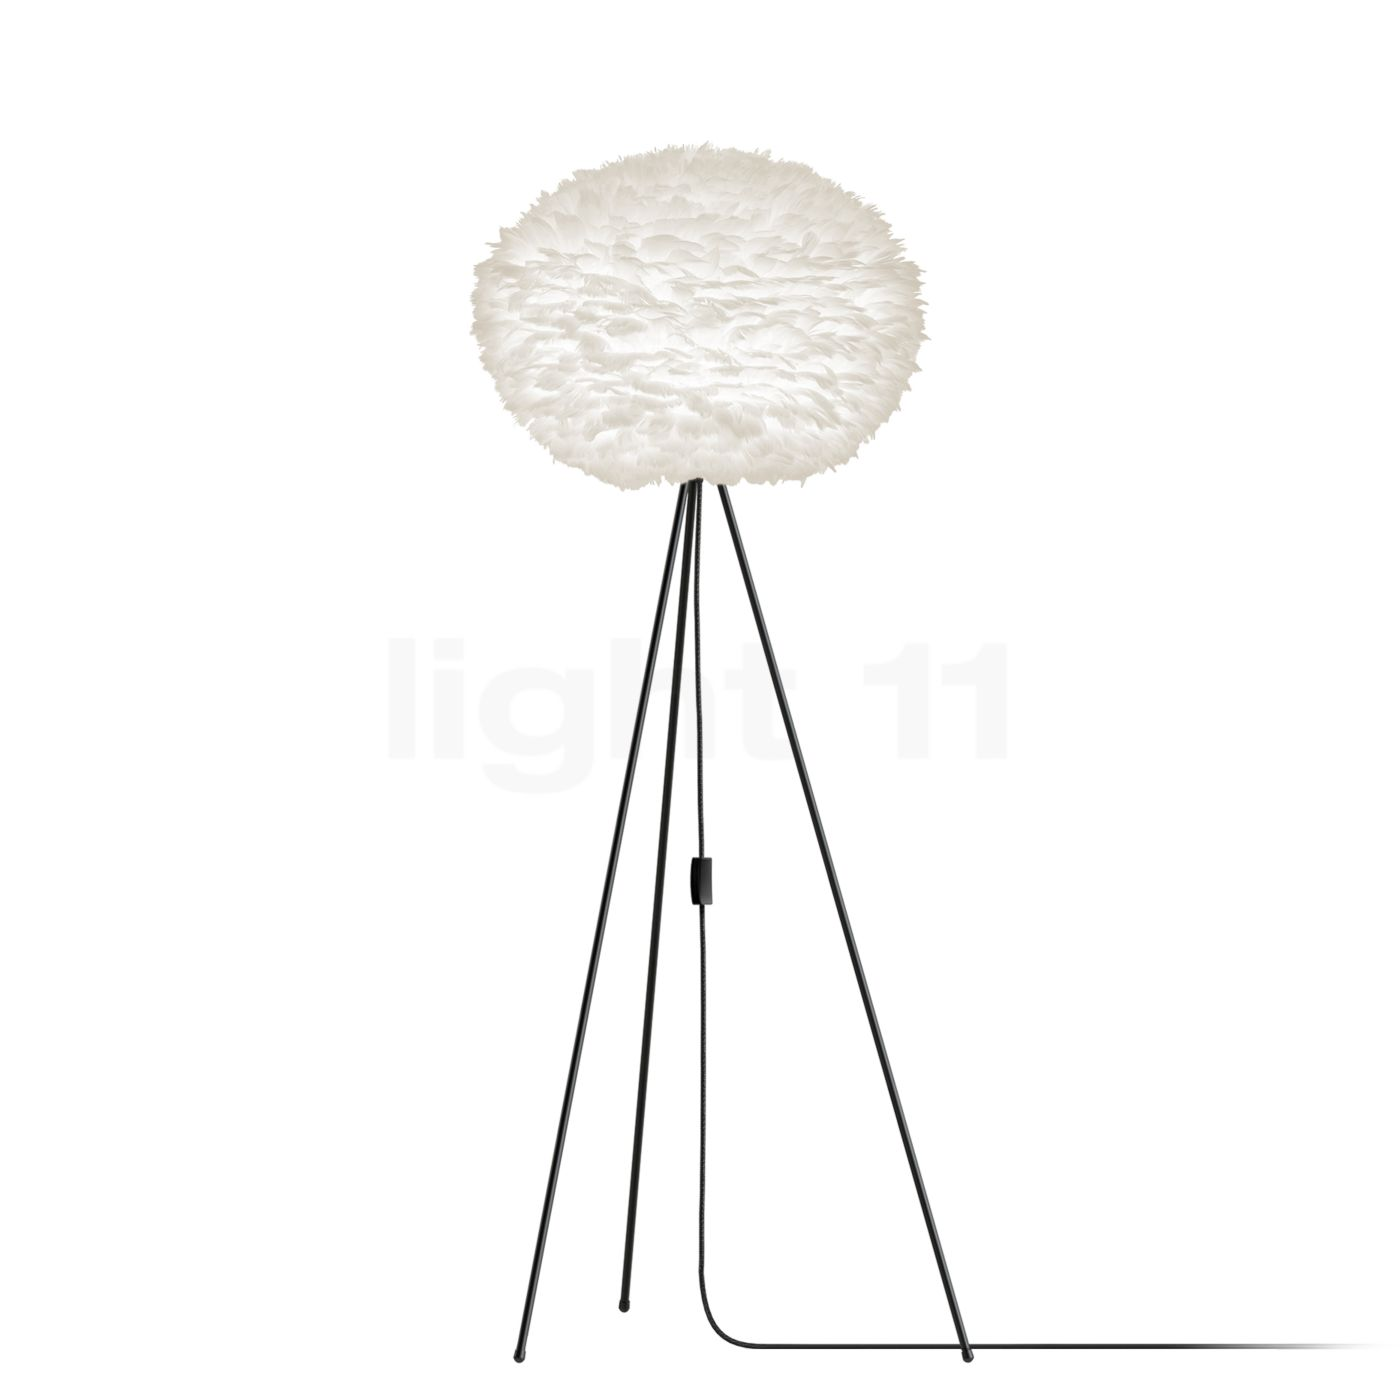 Vita Copenhagen Eos large Tripod Floor Lamp Floor lamps